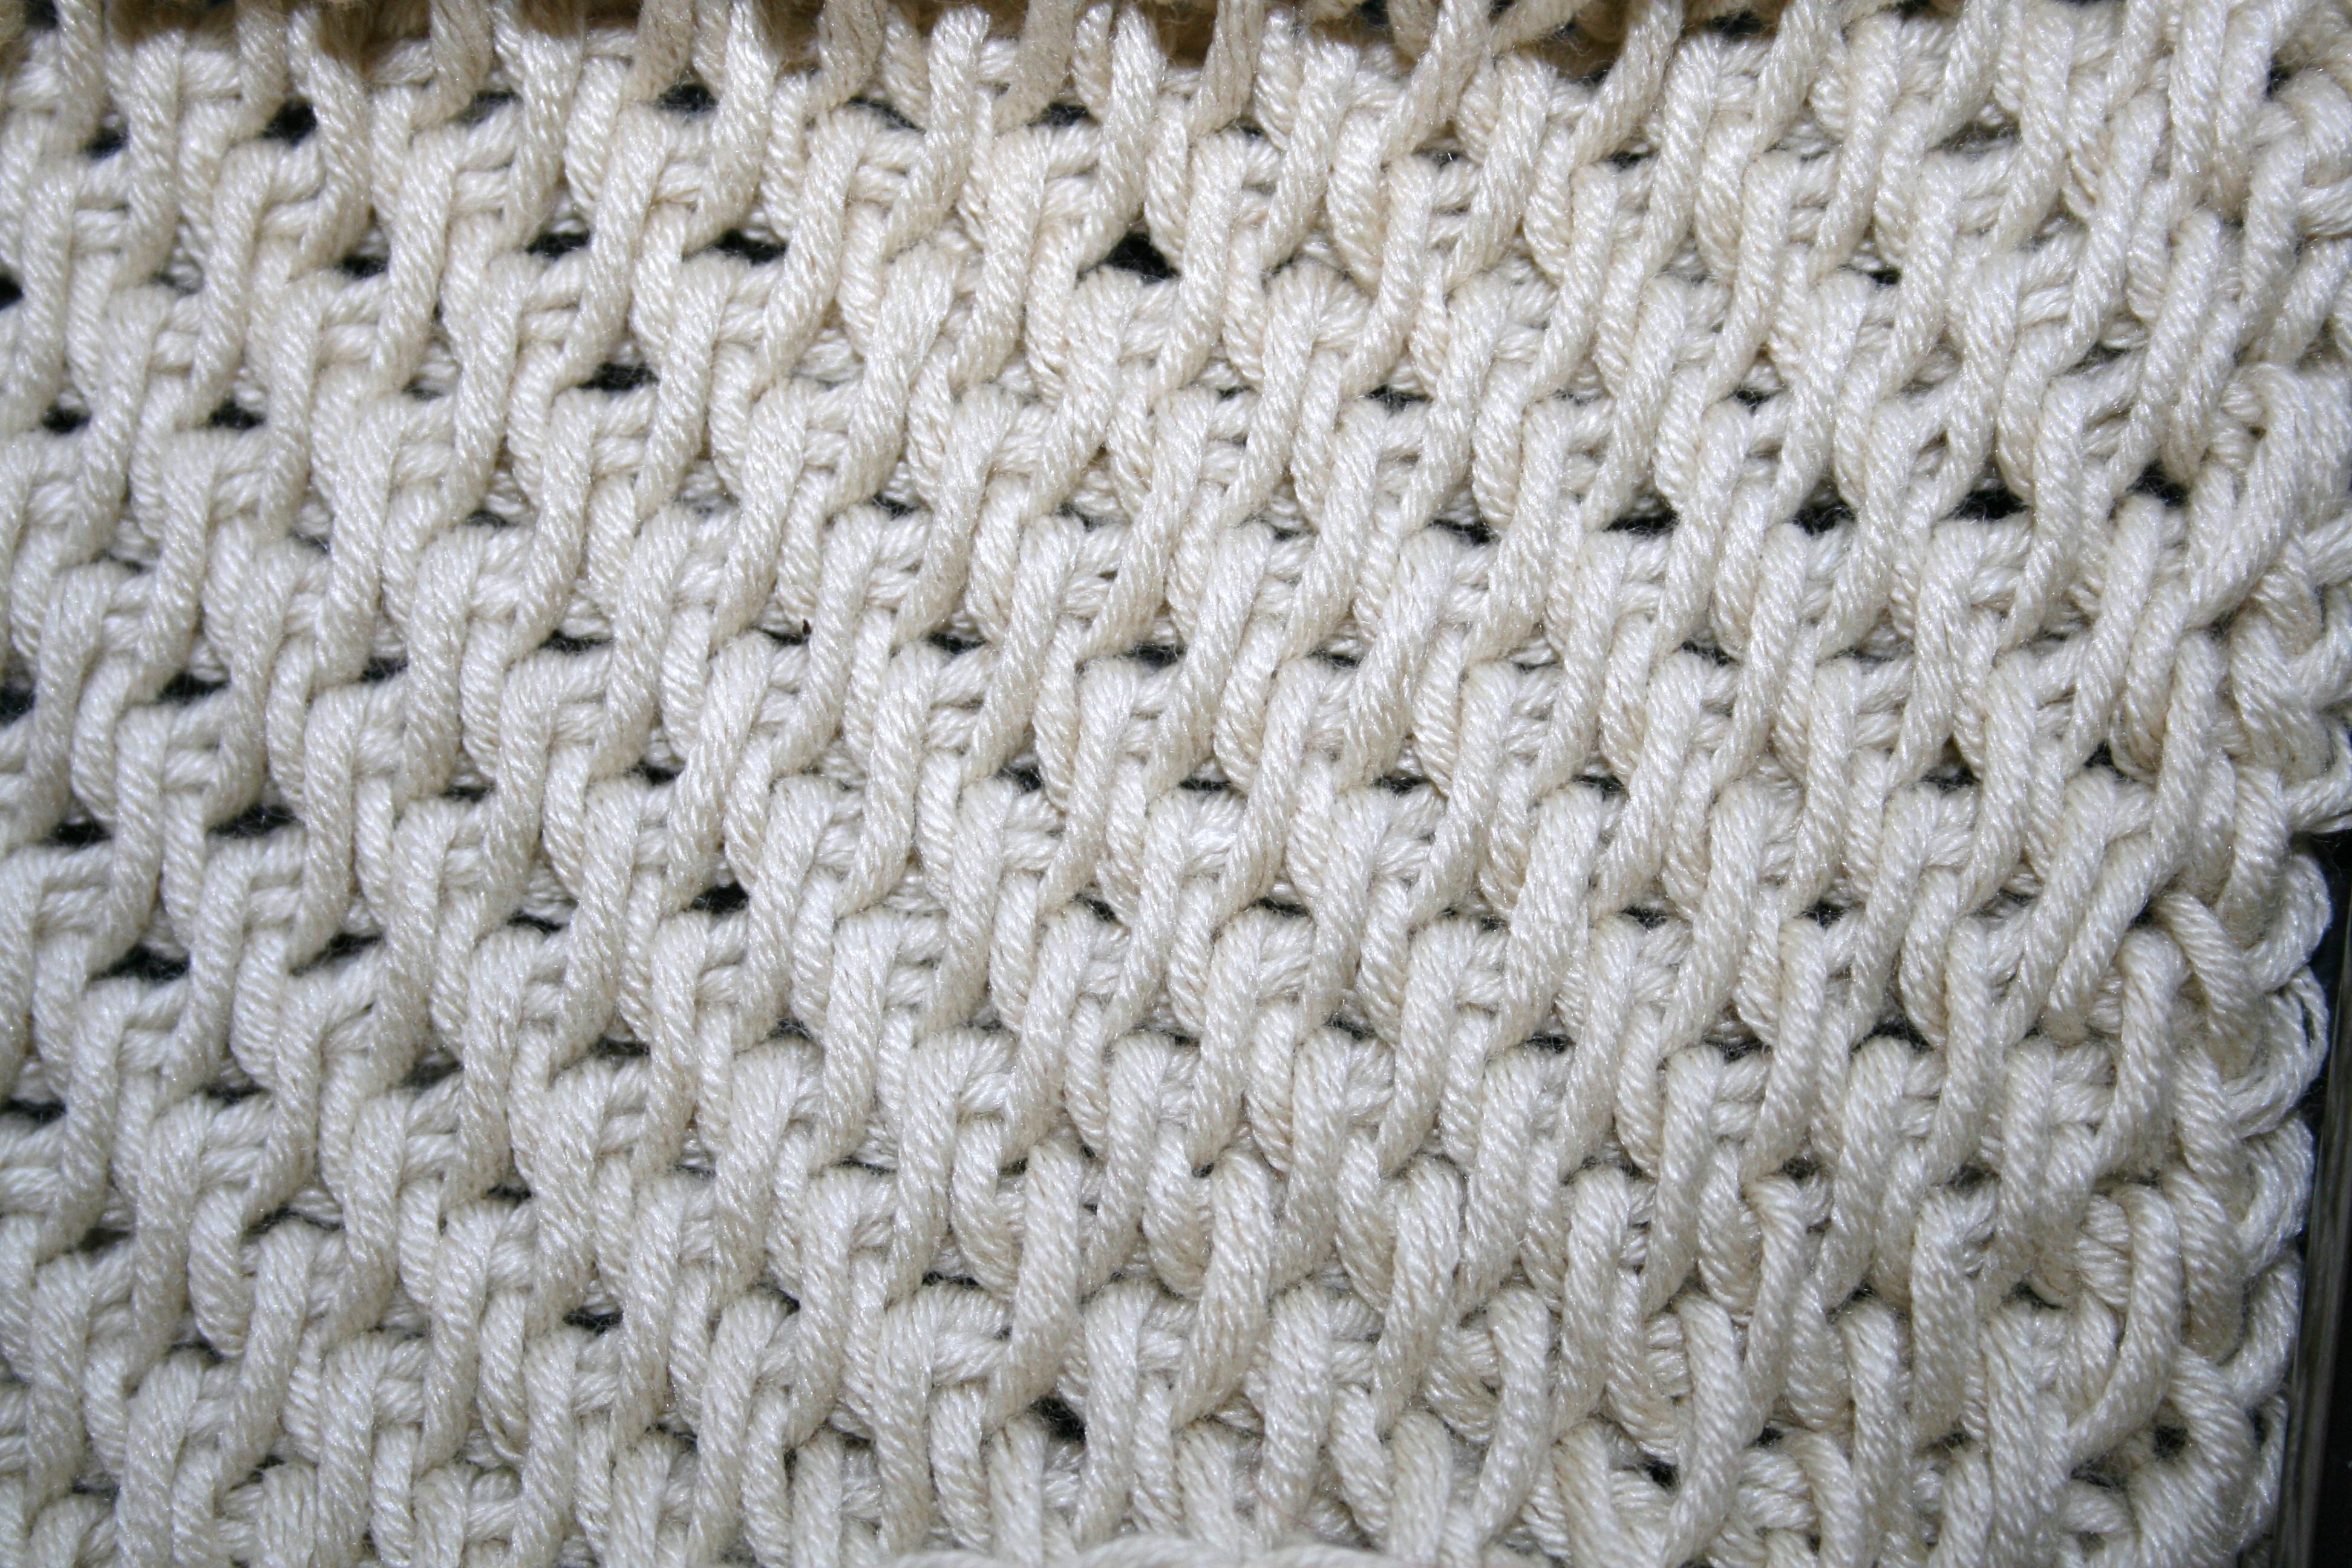 Crochet Stitches How To Do Them : Tunisian Full Stitch Linda Dean Crochet